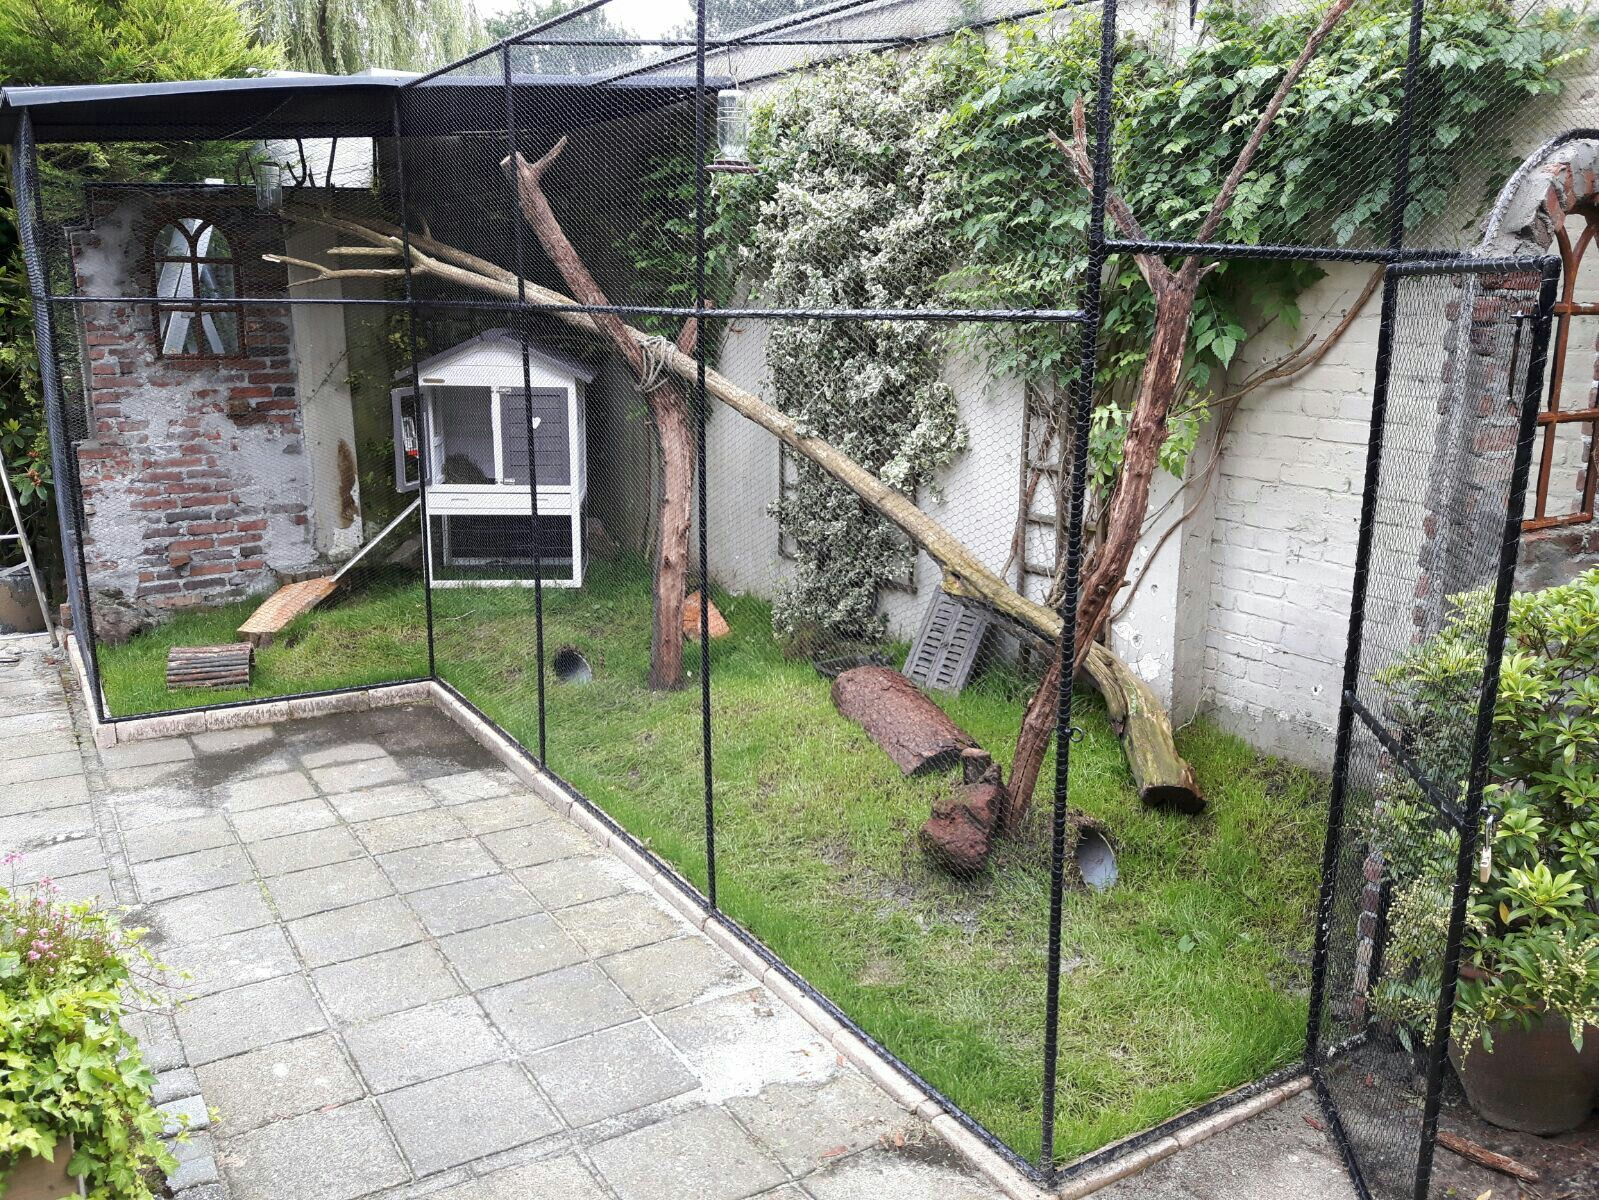 Rabbithouse outdoor konijnenren konijnenkooi buiten for Outdoor rabbit enclosure ideas